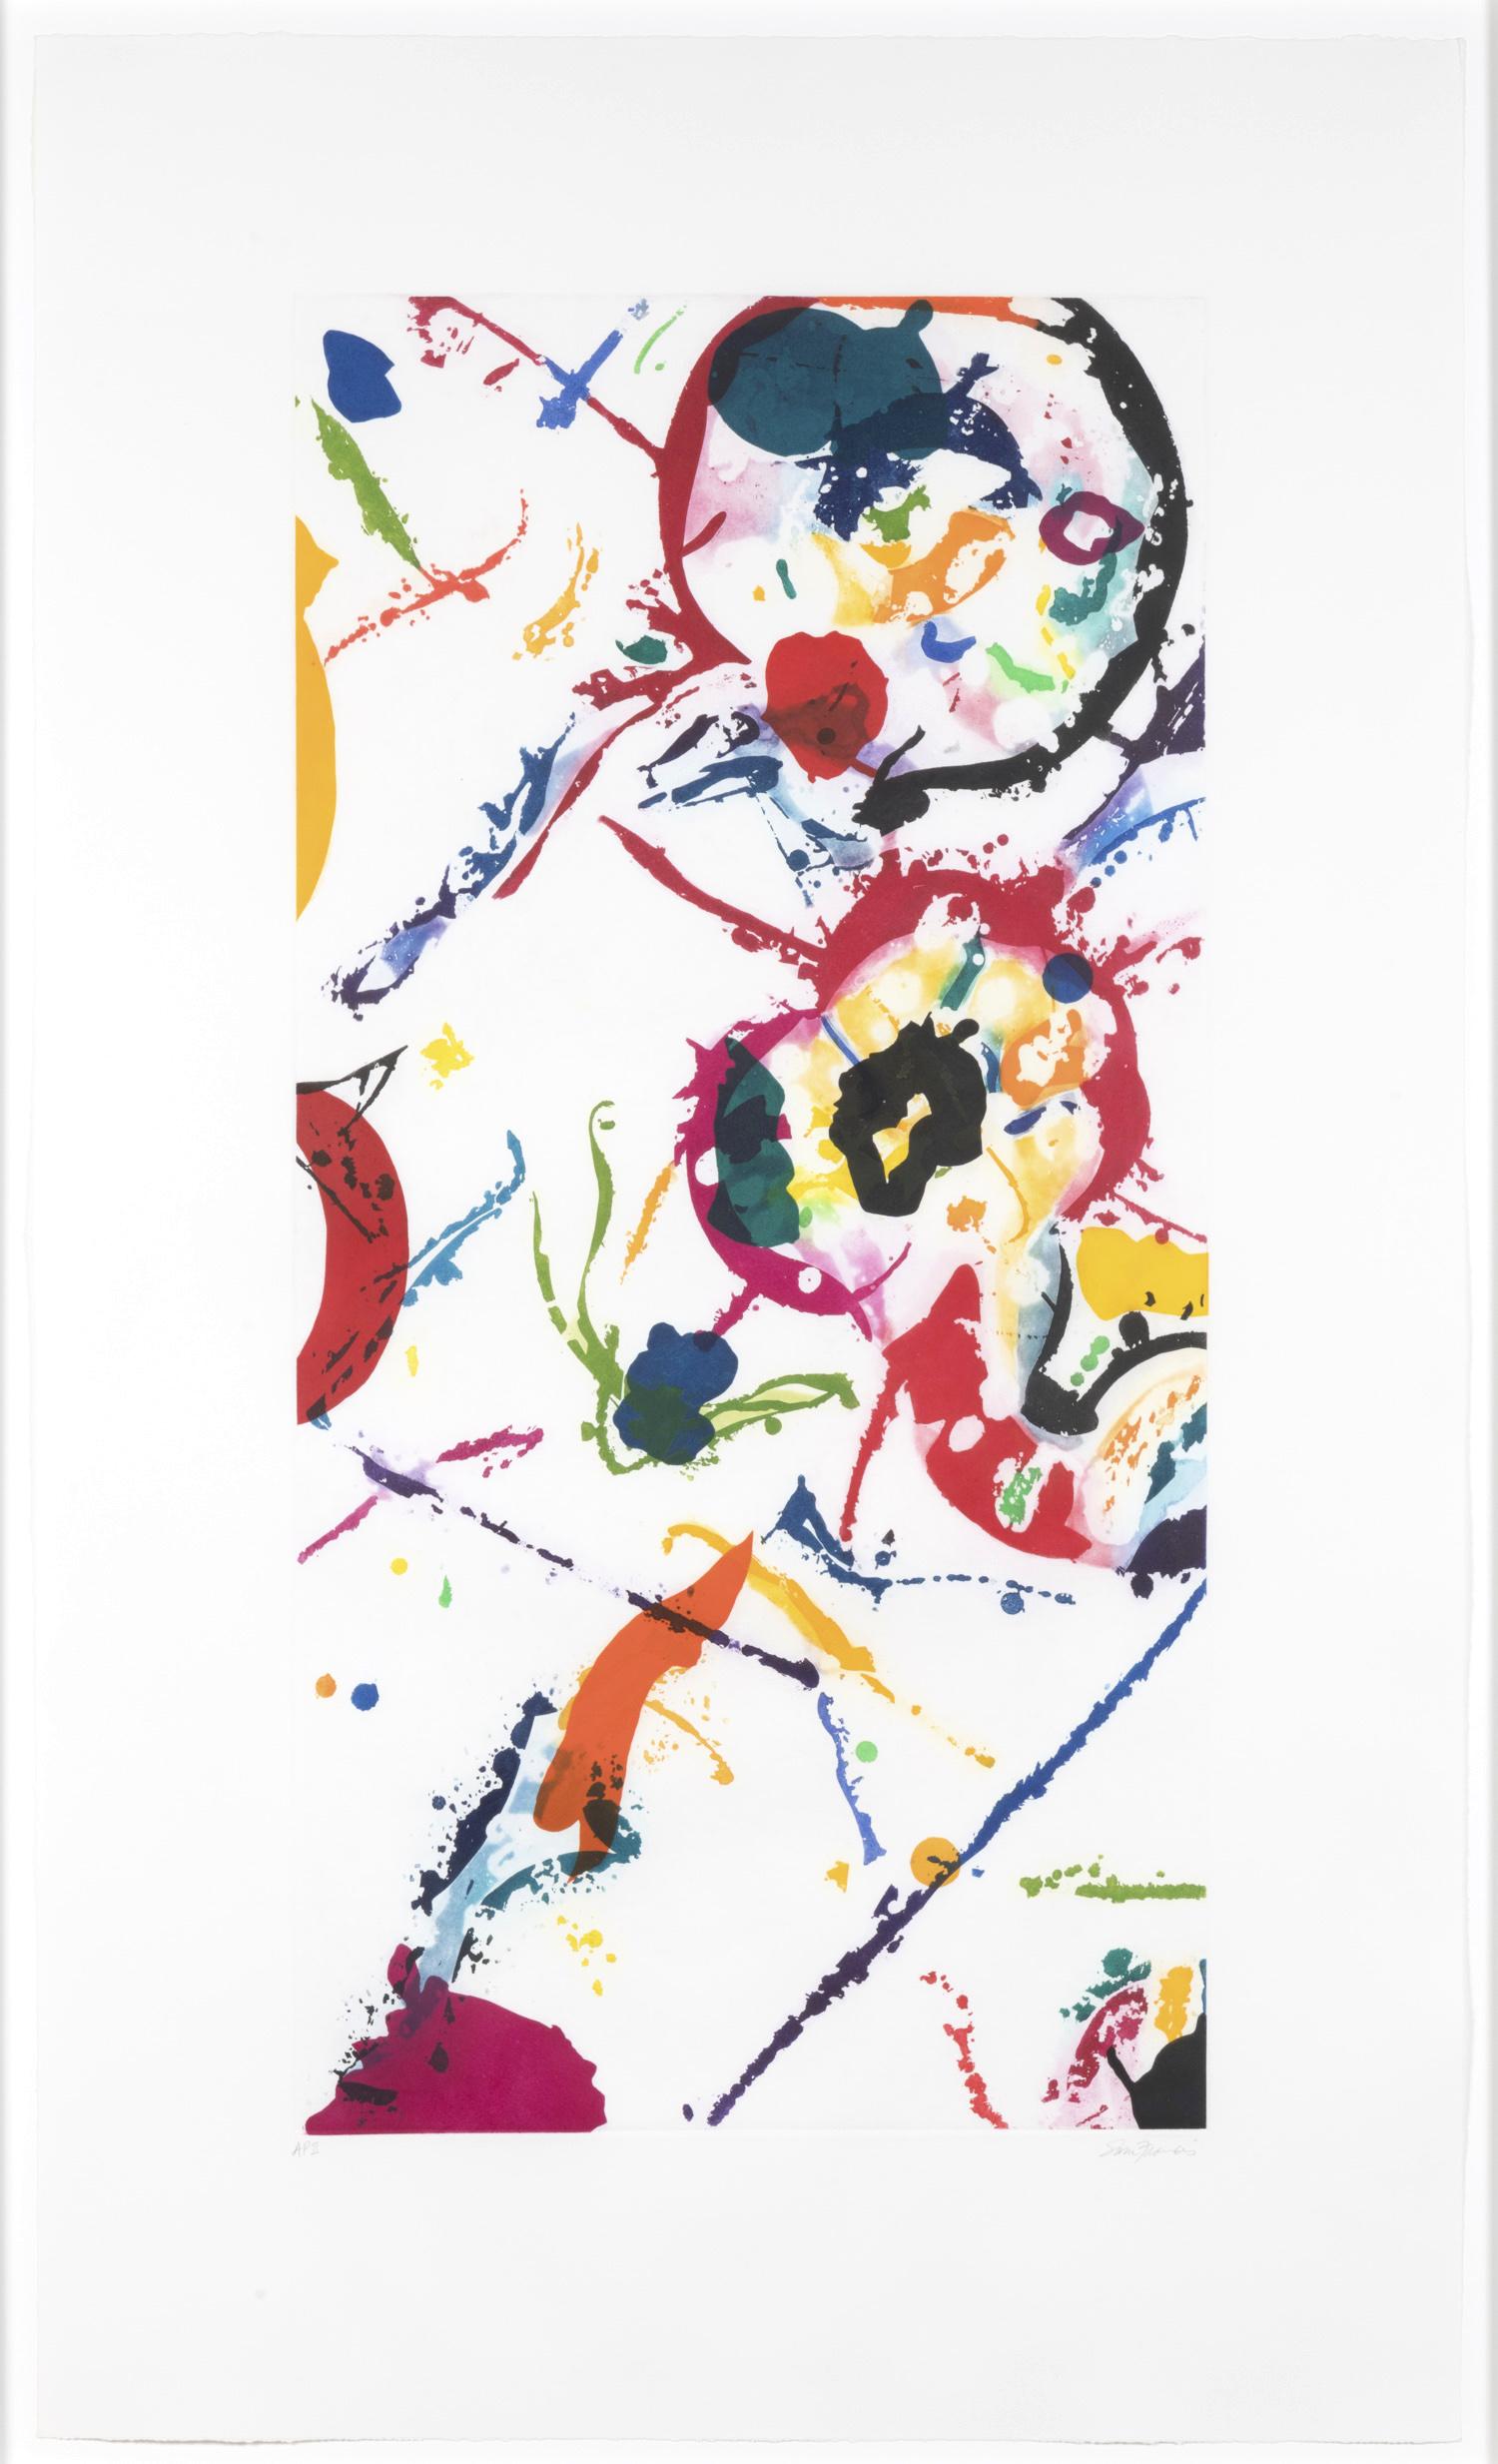 Leo Rising by Sam Francis